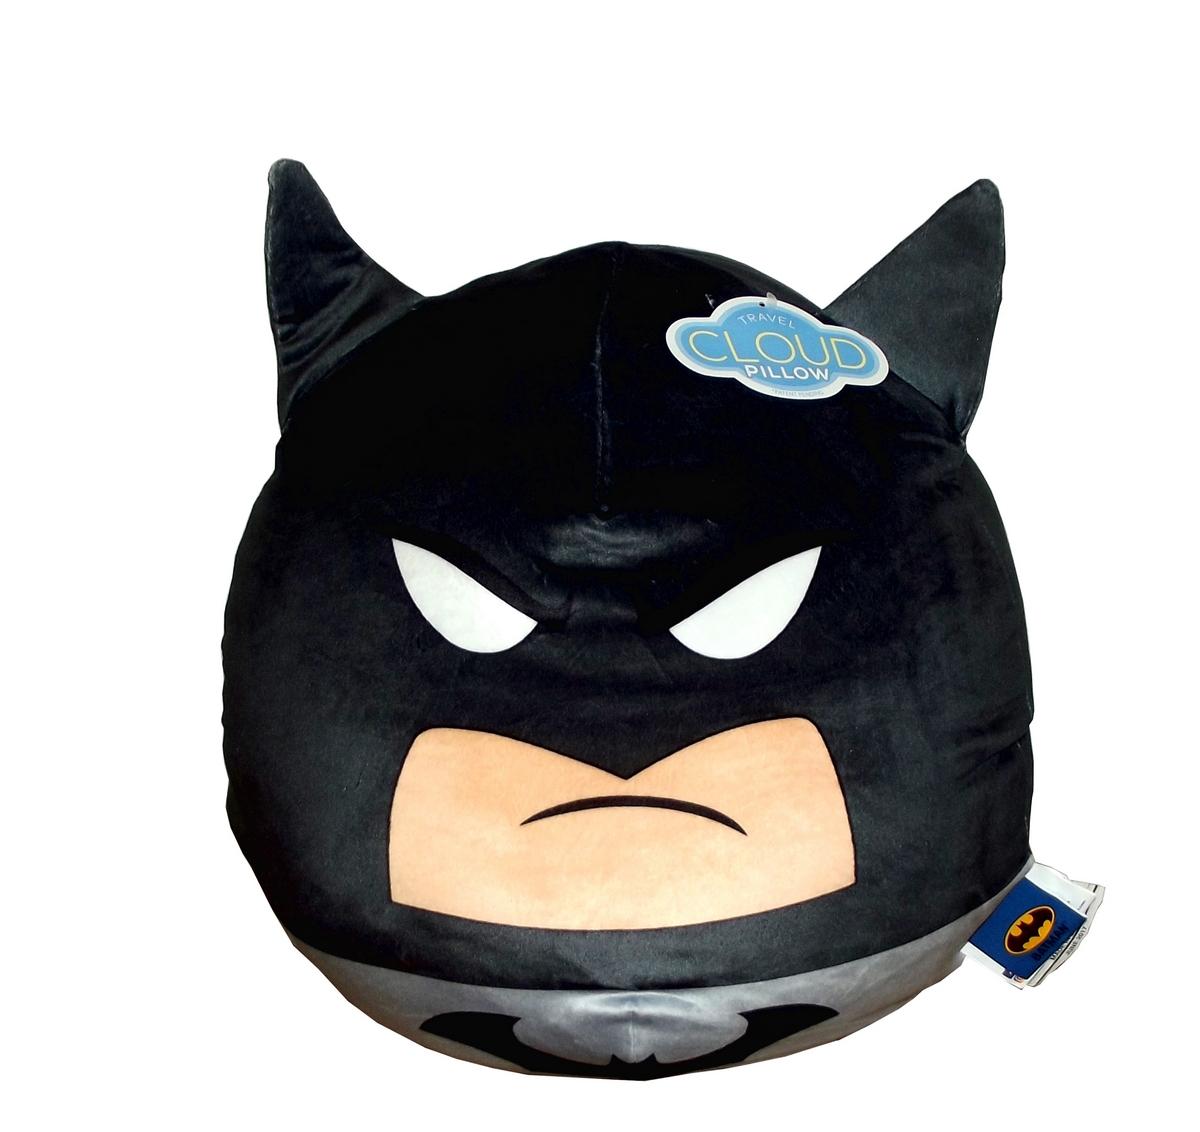 dc comics batman cloud pillow plush toy 14 inches